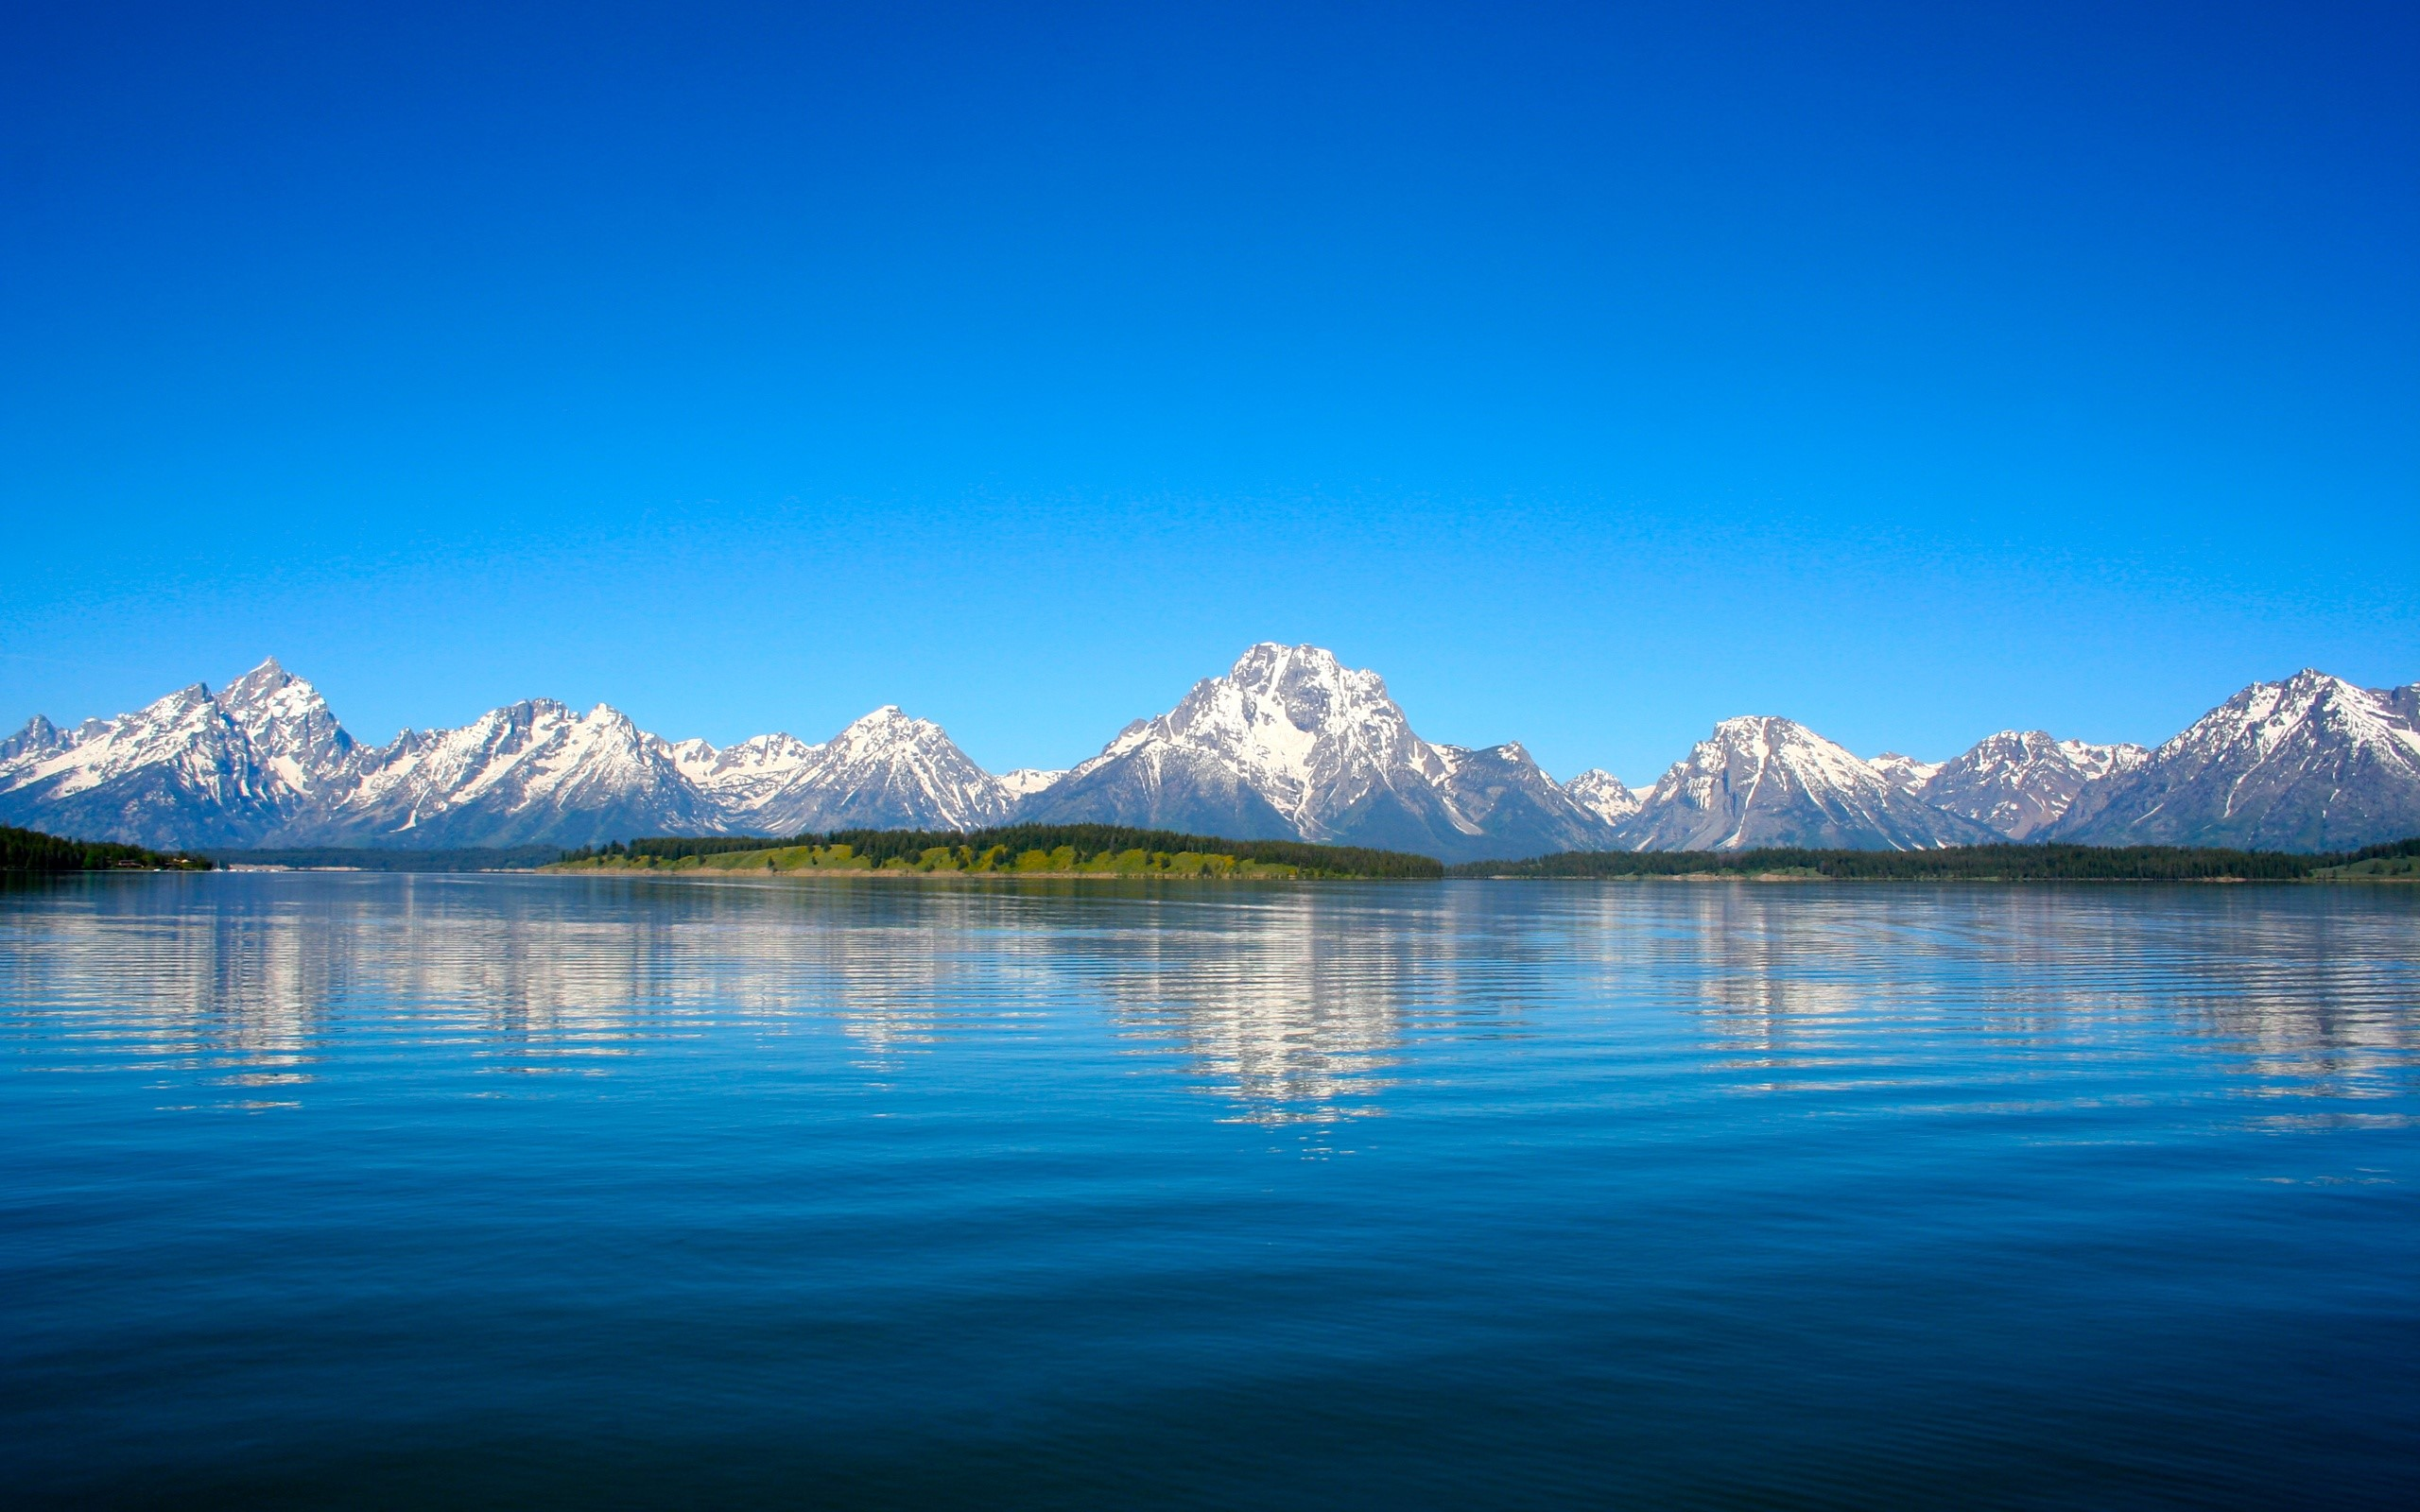 Fondos de pantalla Montañas del parque Grand Teton